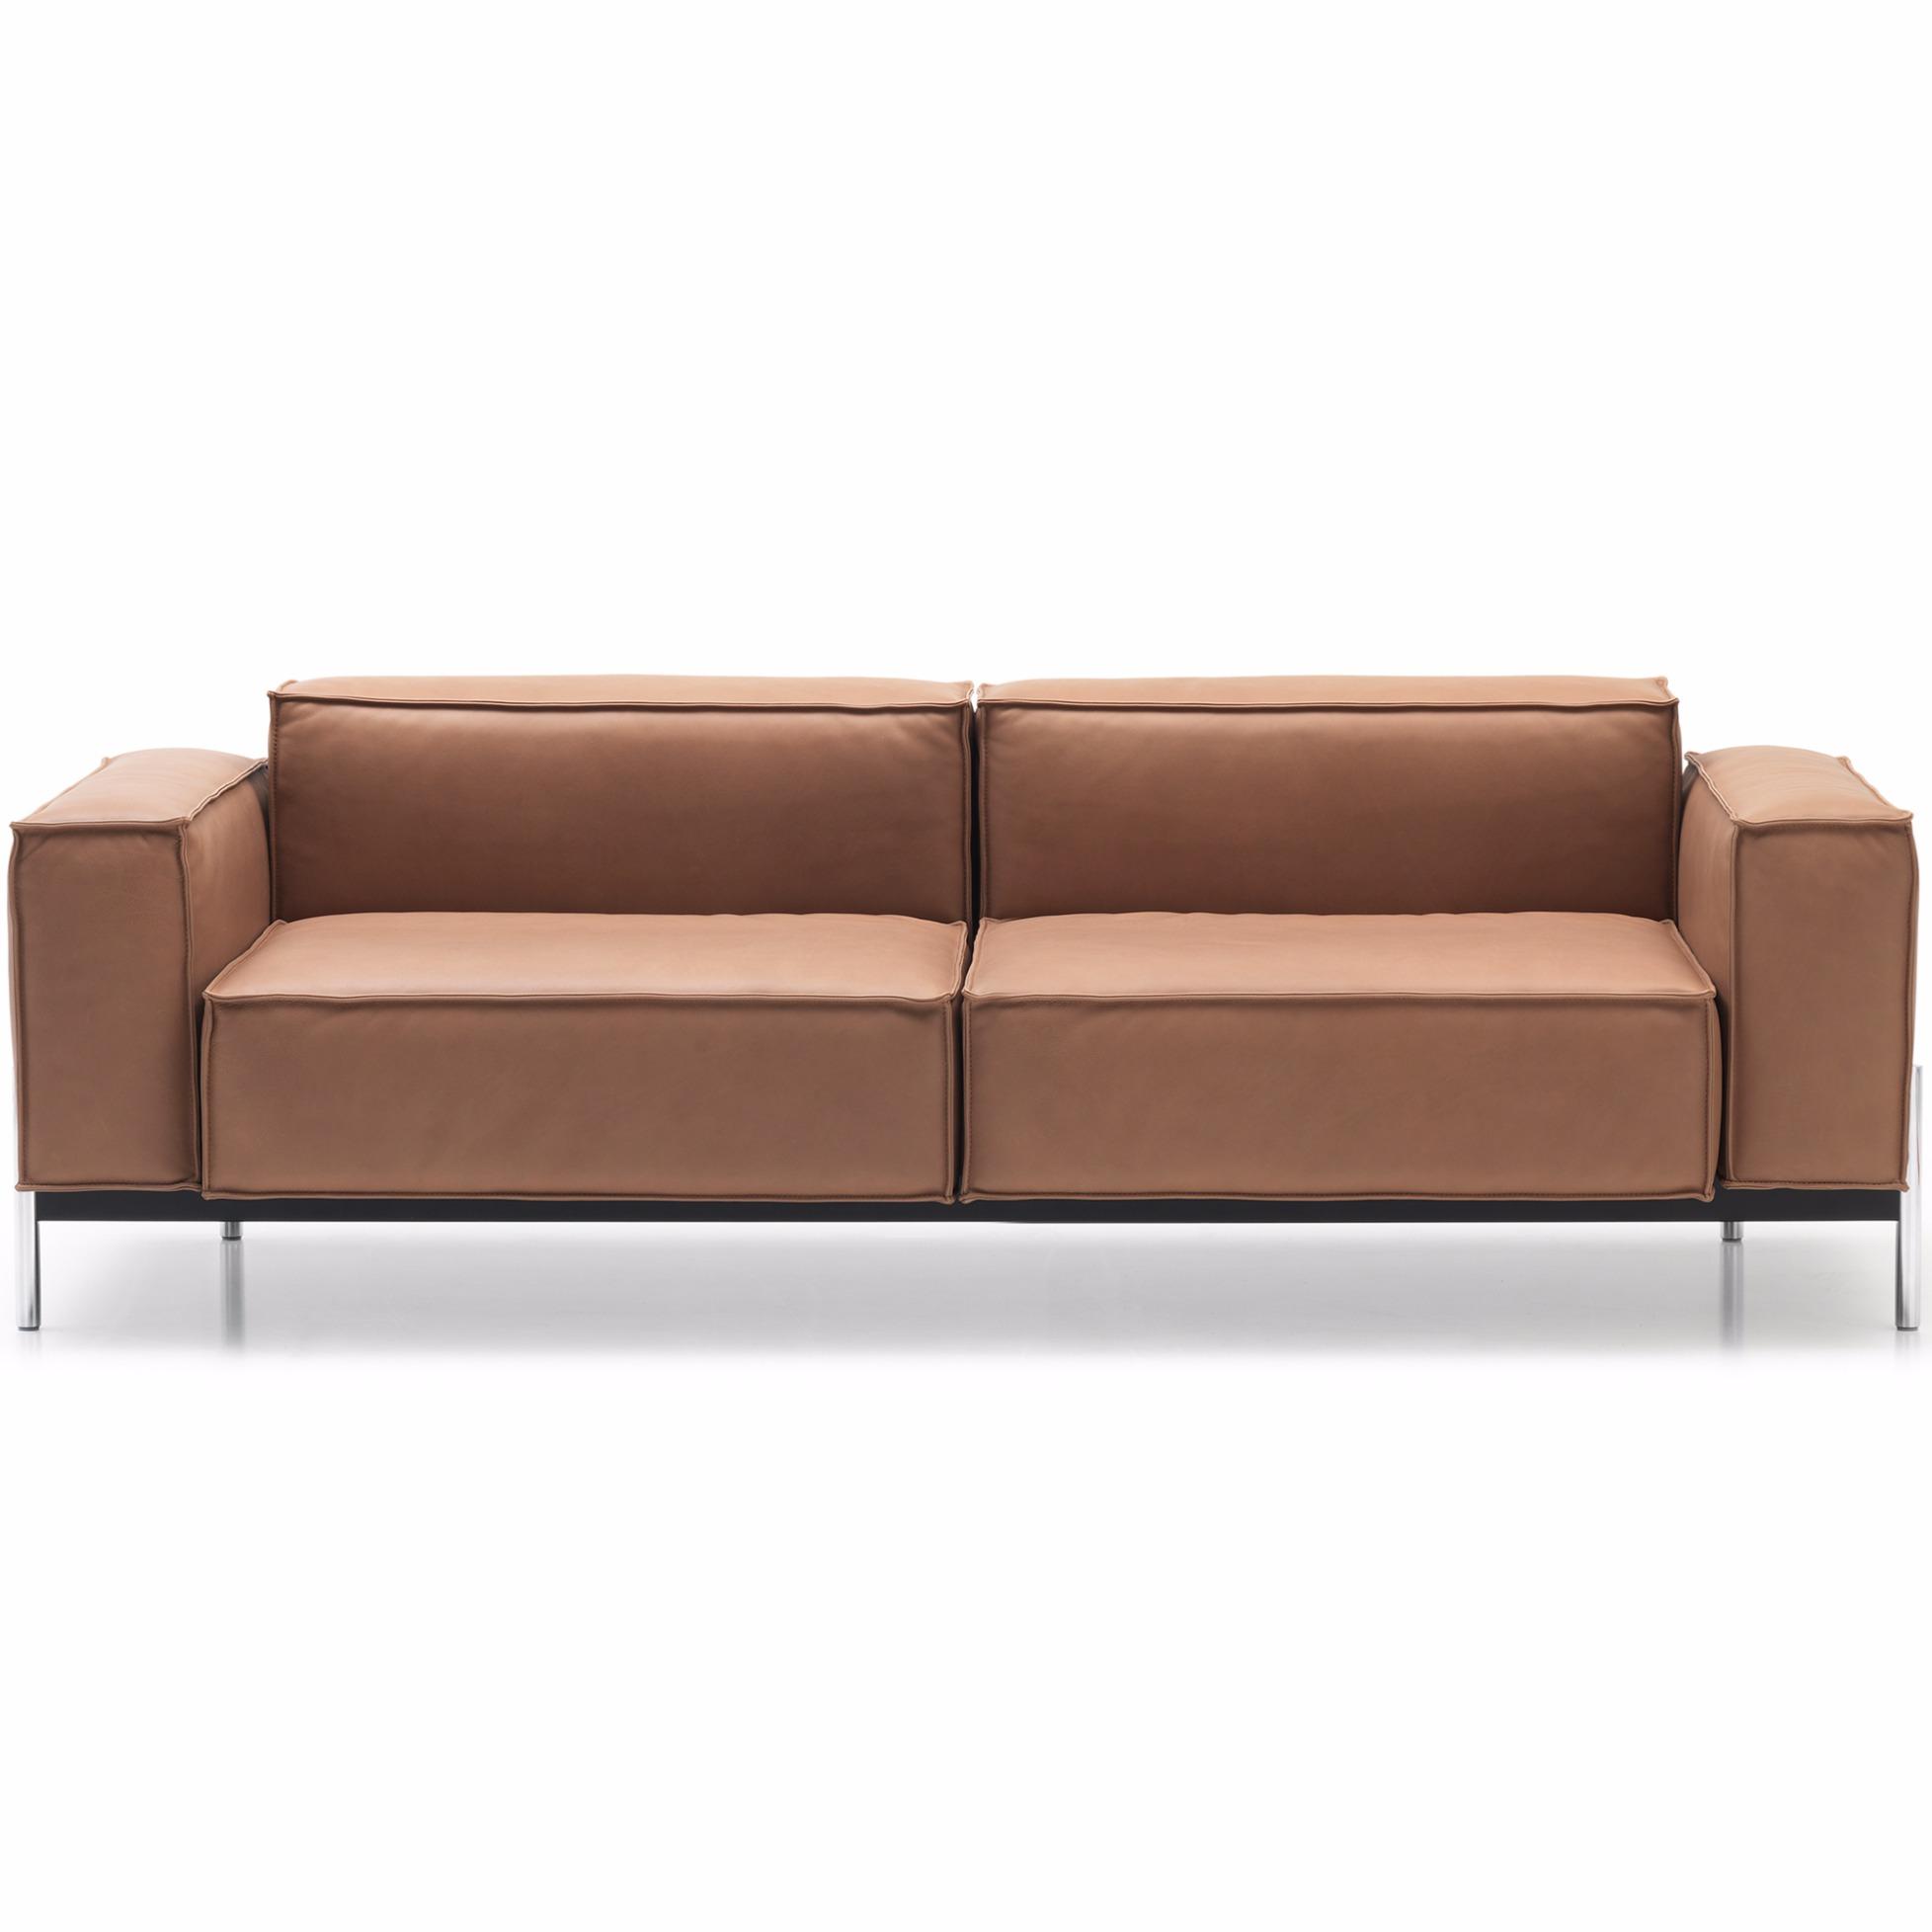 Sofa Ds 21 23 Von De Sede